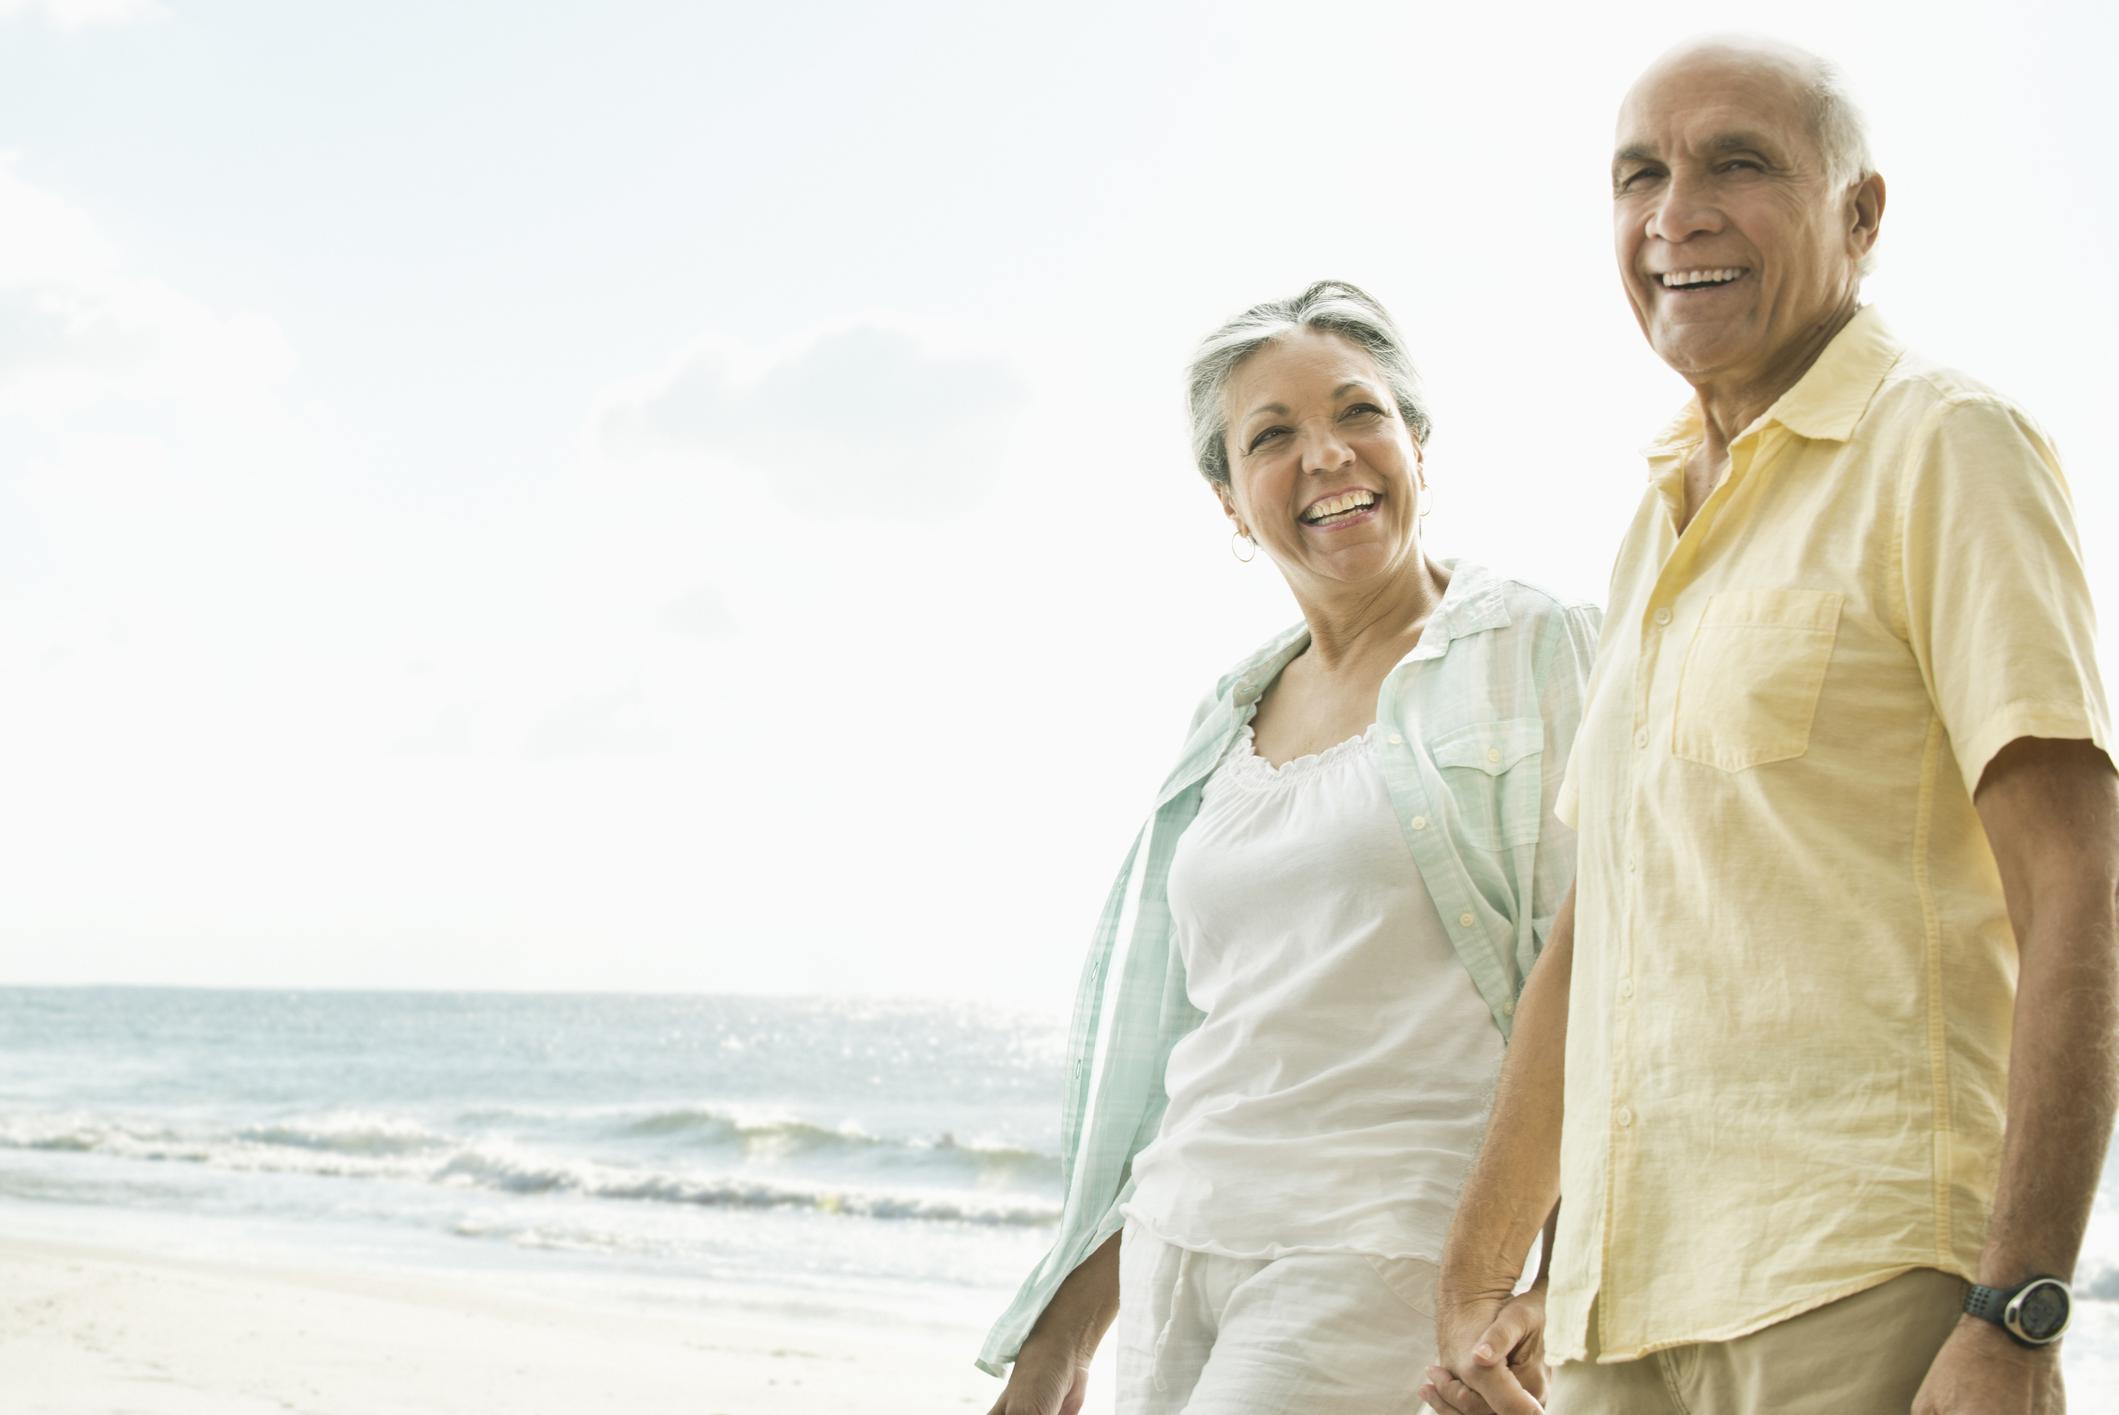 Adultos-mayores-cita-romantica.jpg